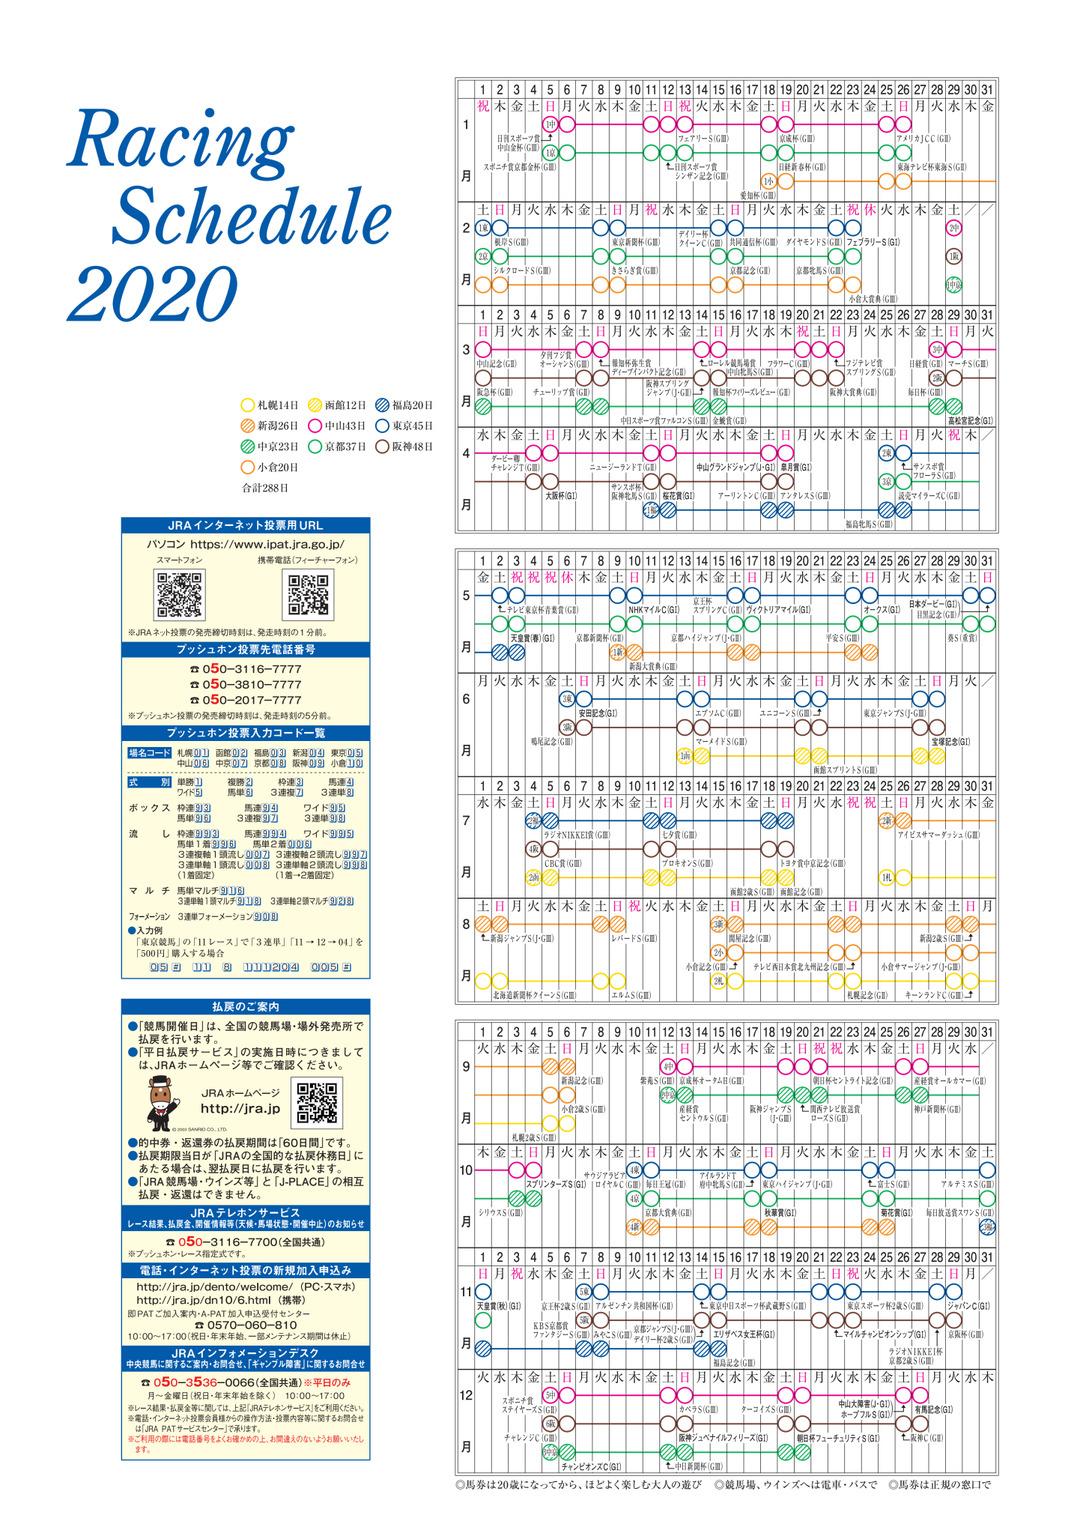 IMG_20201227_115904